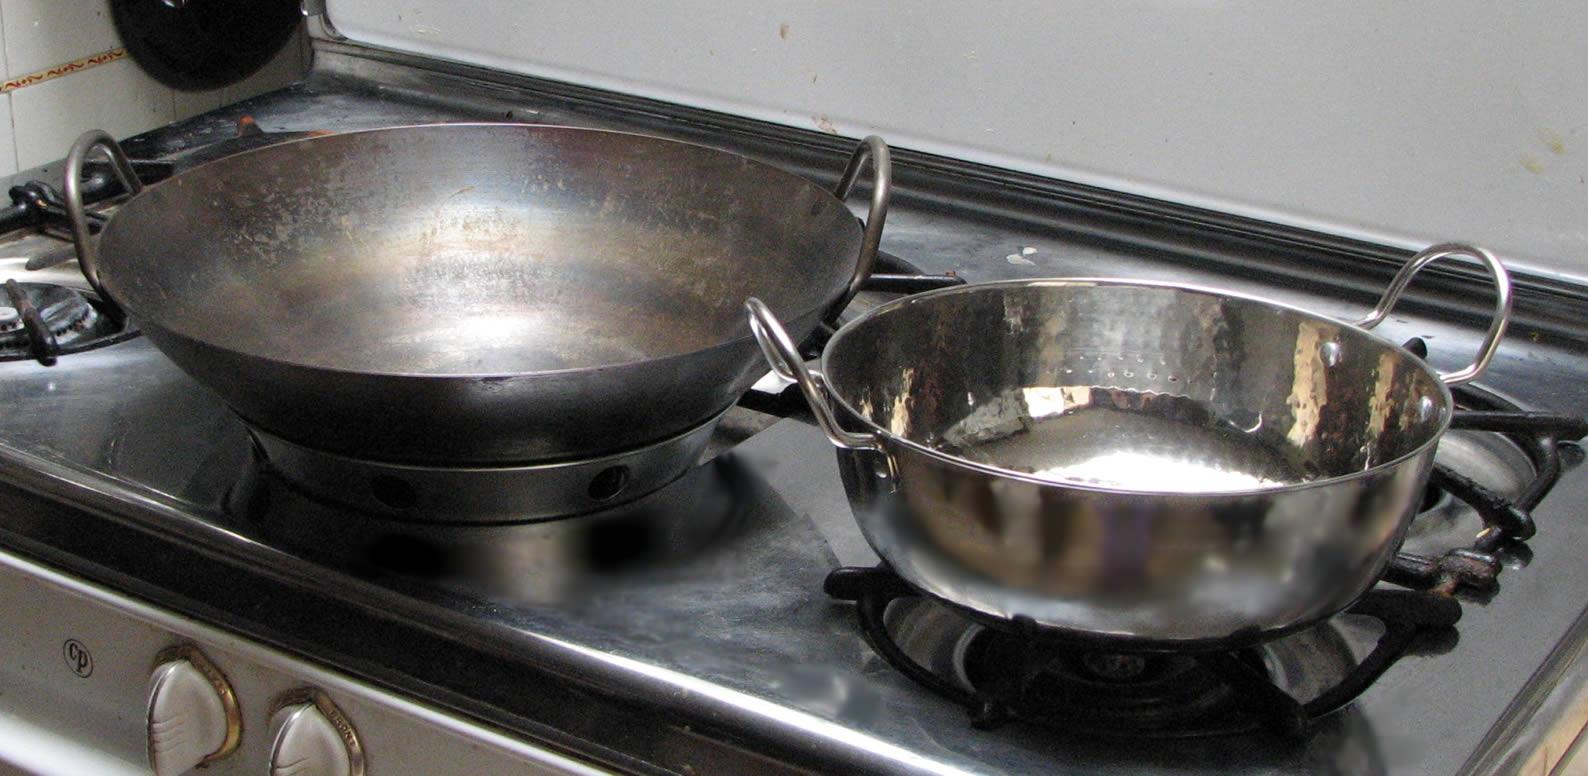 Wok In Kitchen Riverside Menu